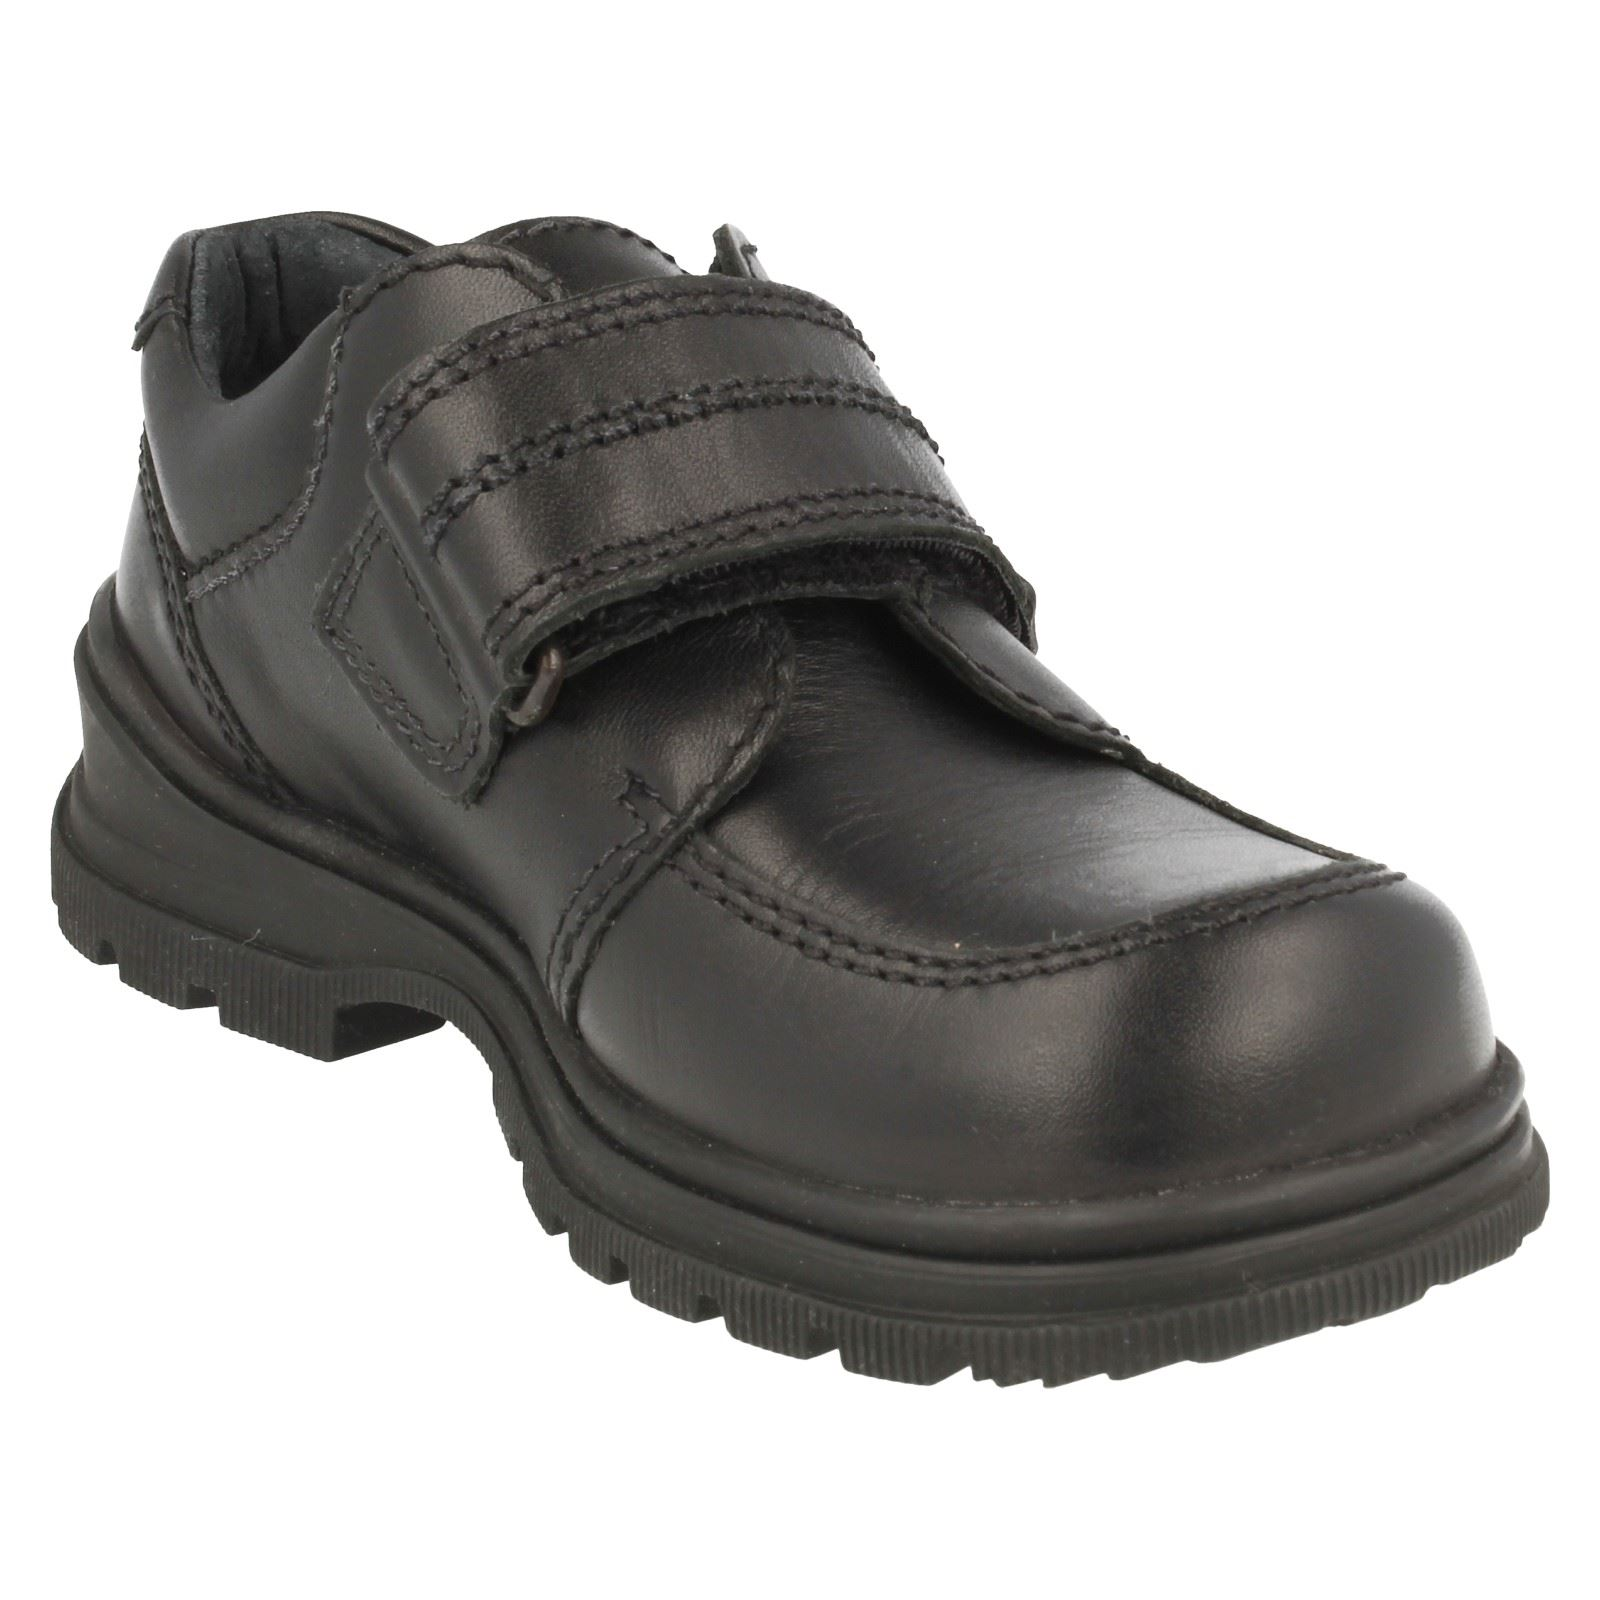 Chicos Startrite Zapatos Escolares Campbell